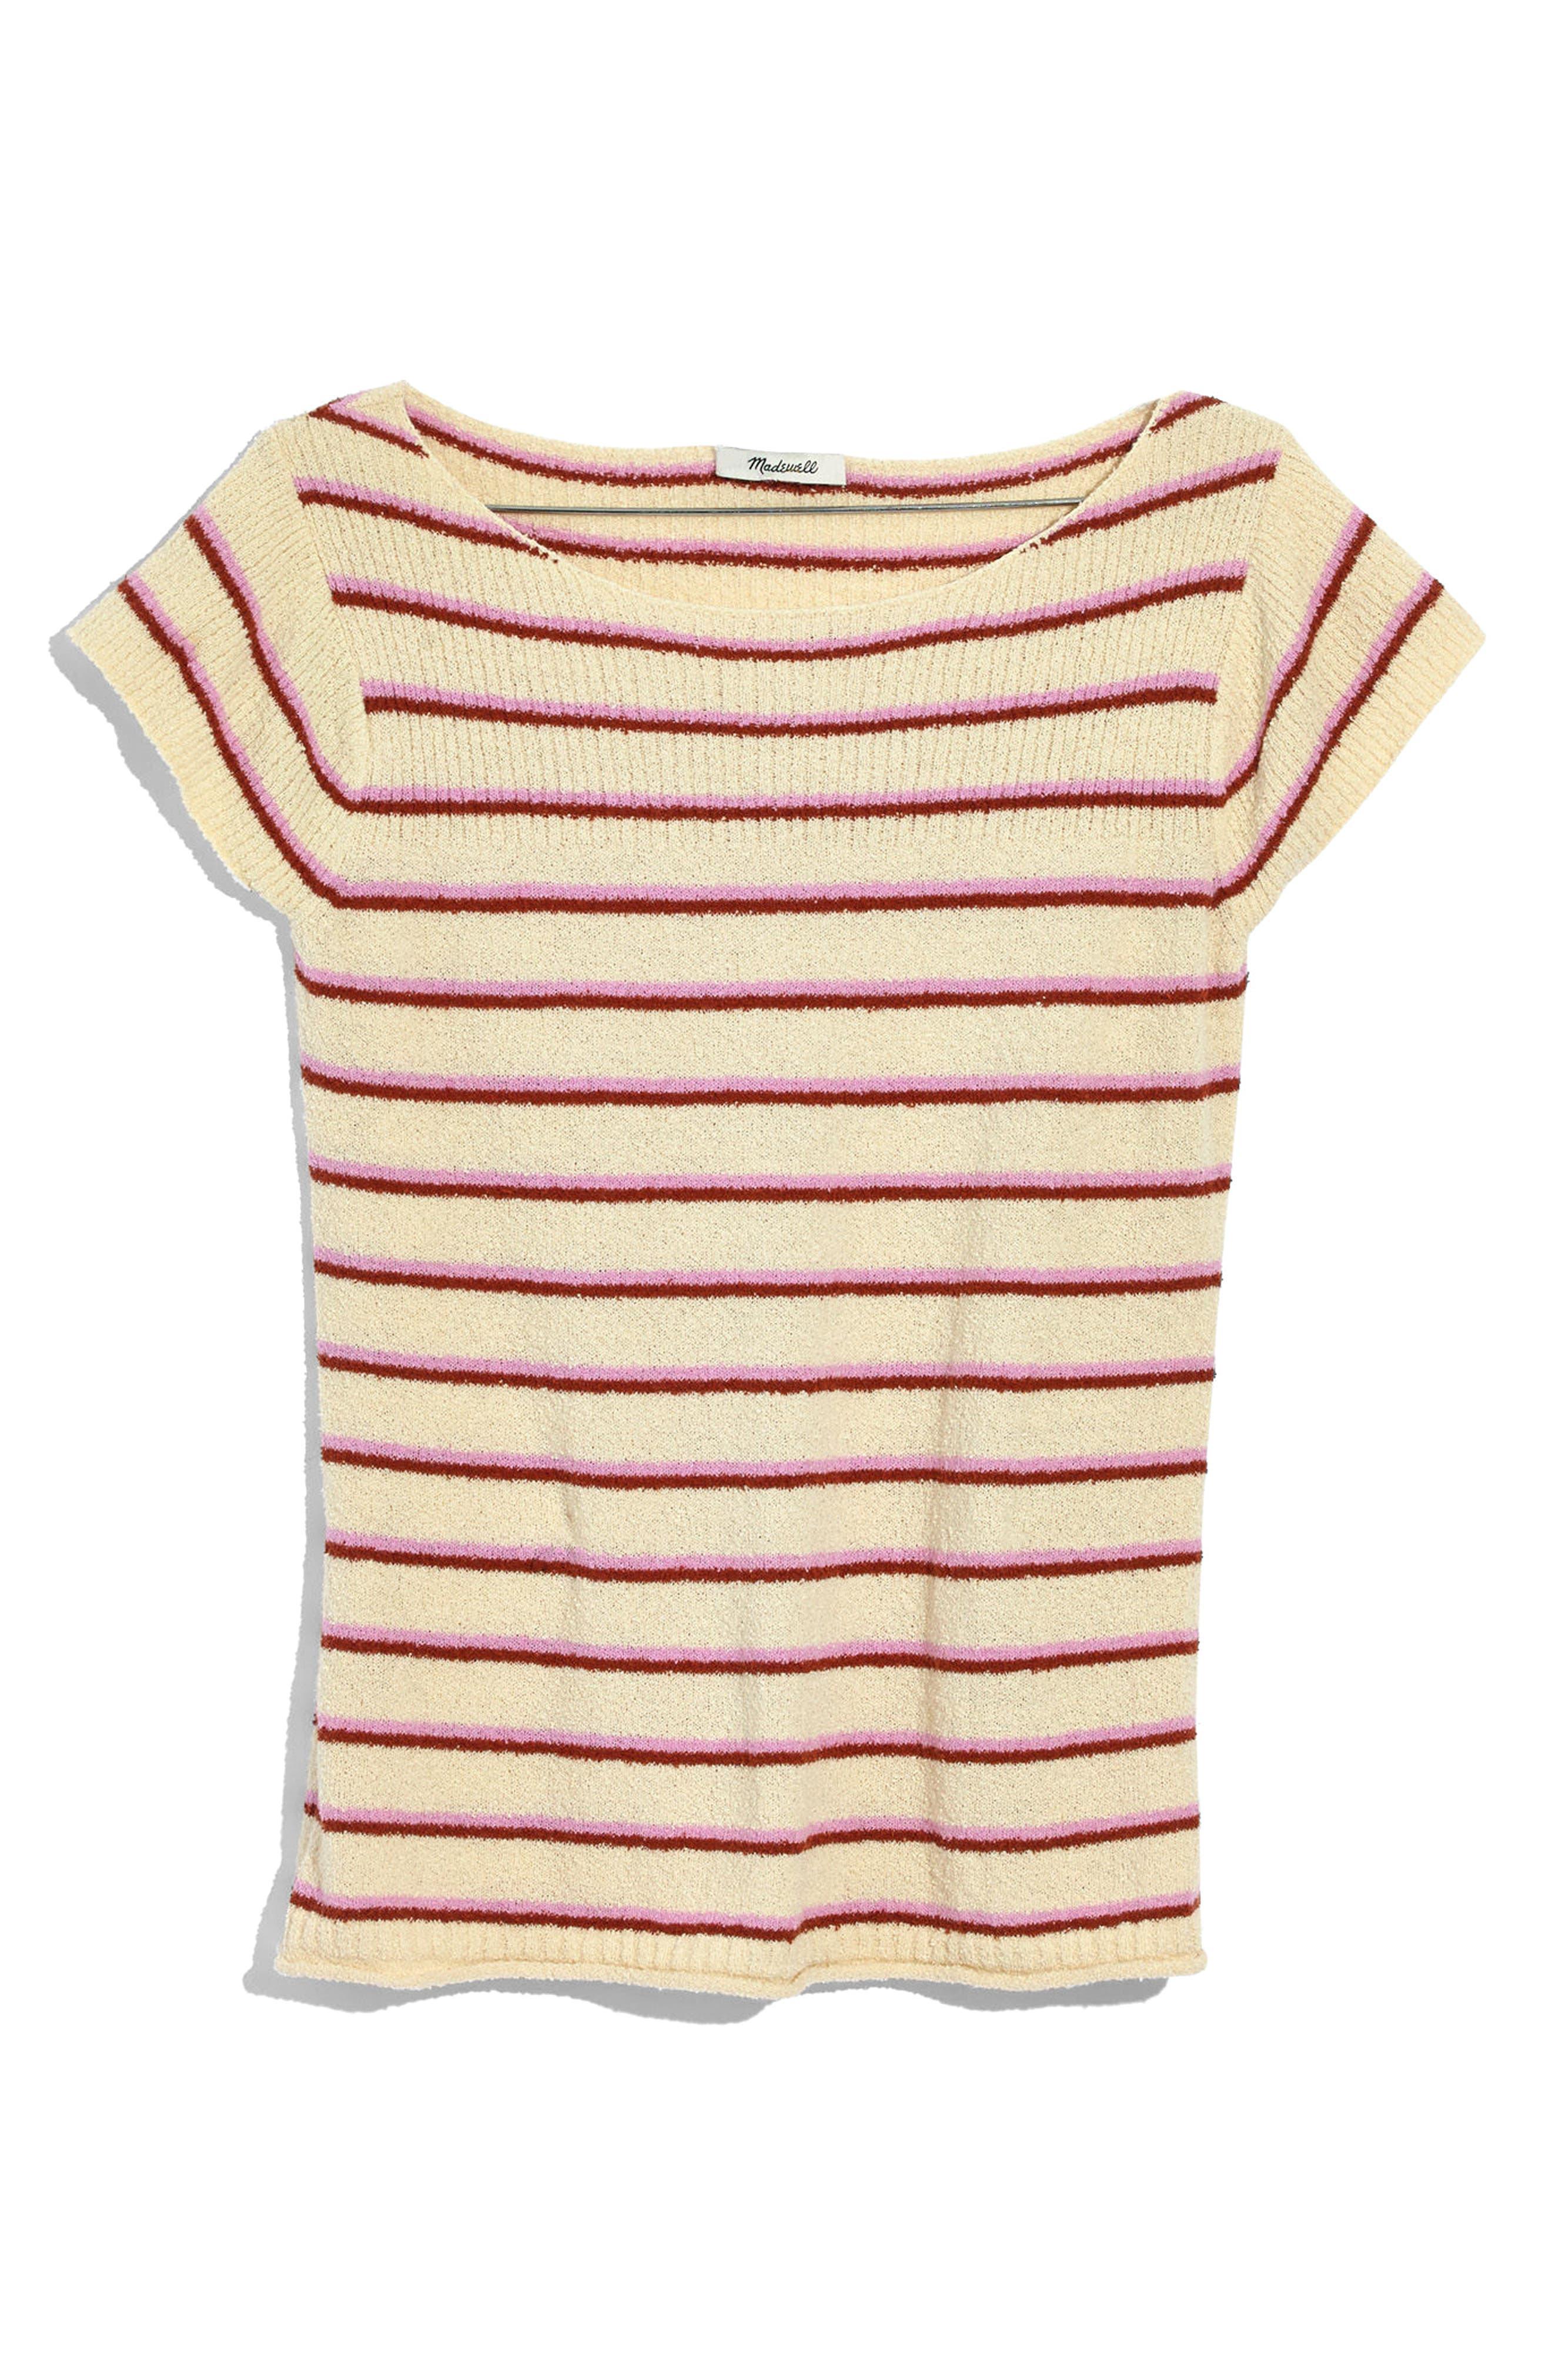 Marin Stripe Sweater Tee,                             Alternate thumbnail 3, color,                             Eggshell